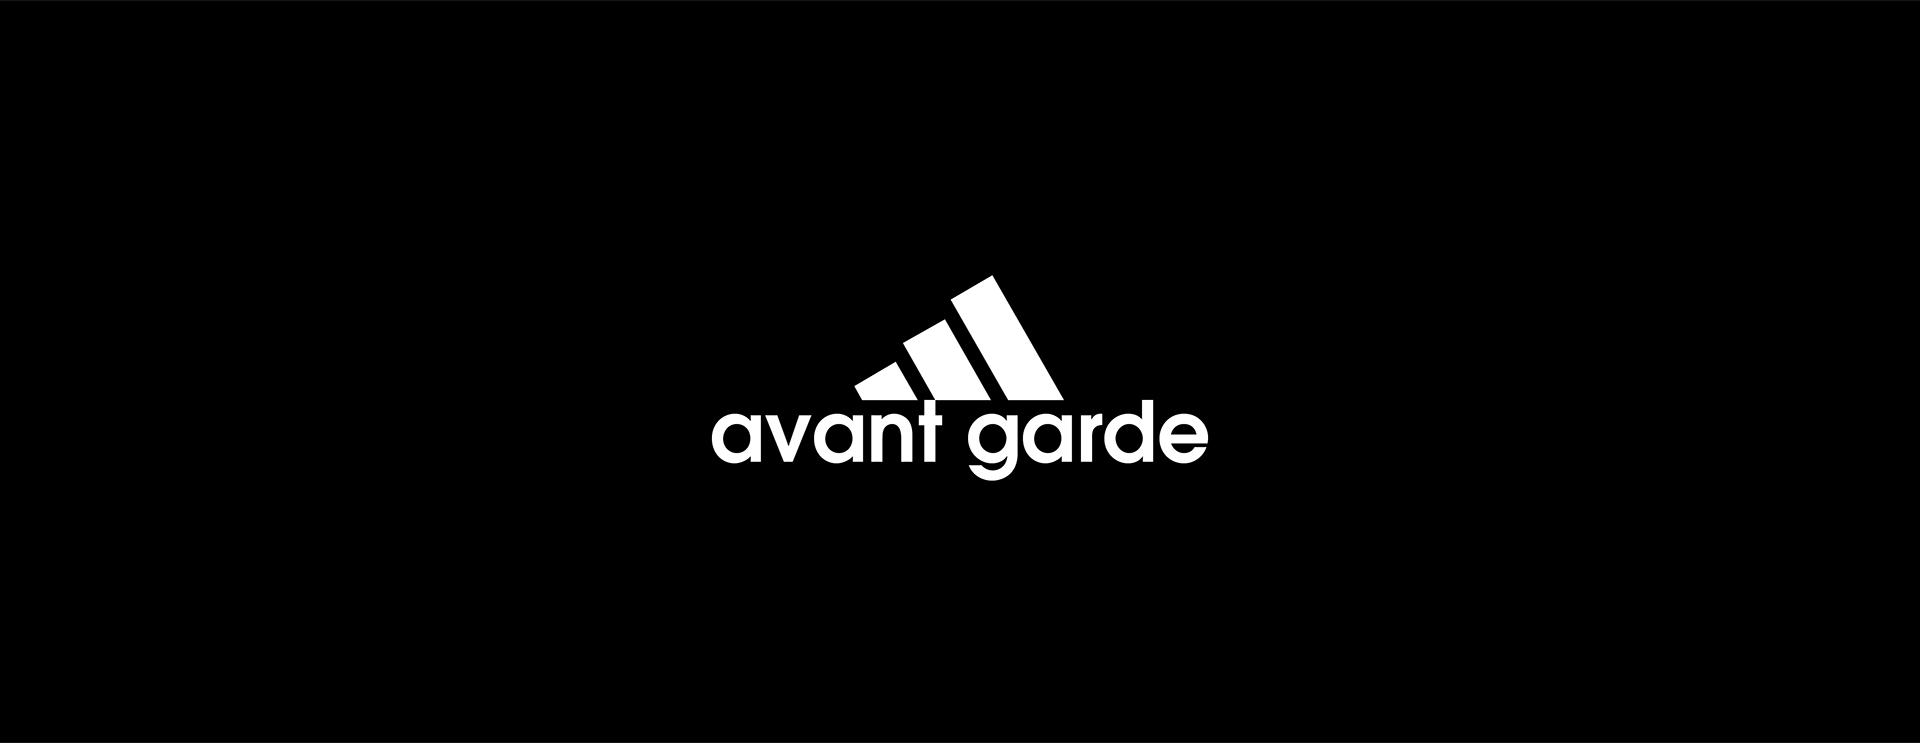 logo-fonts-design-brands-creative